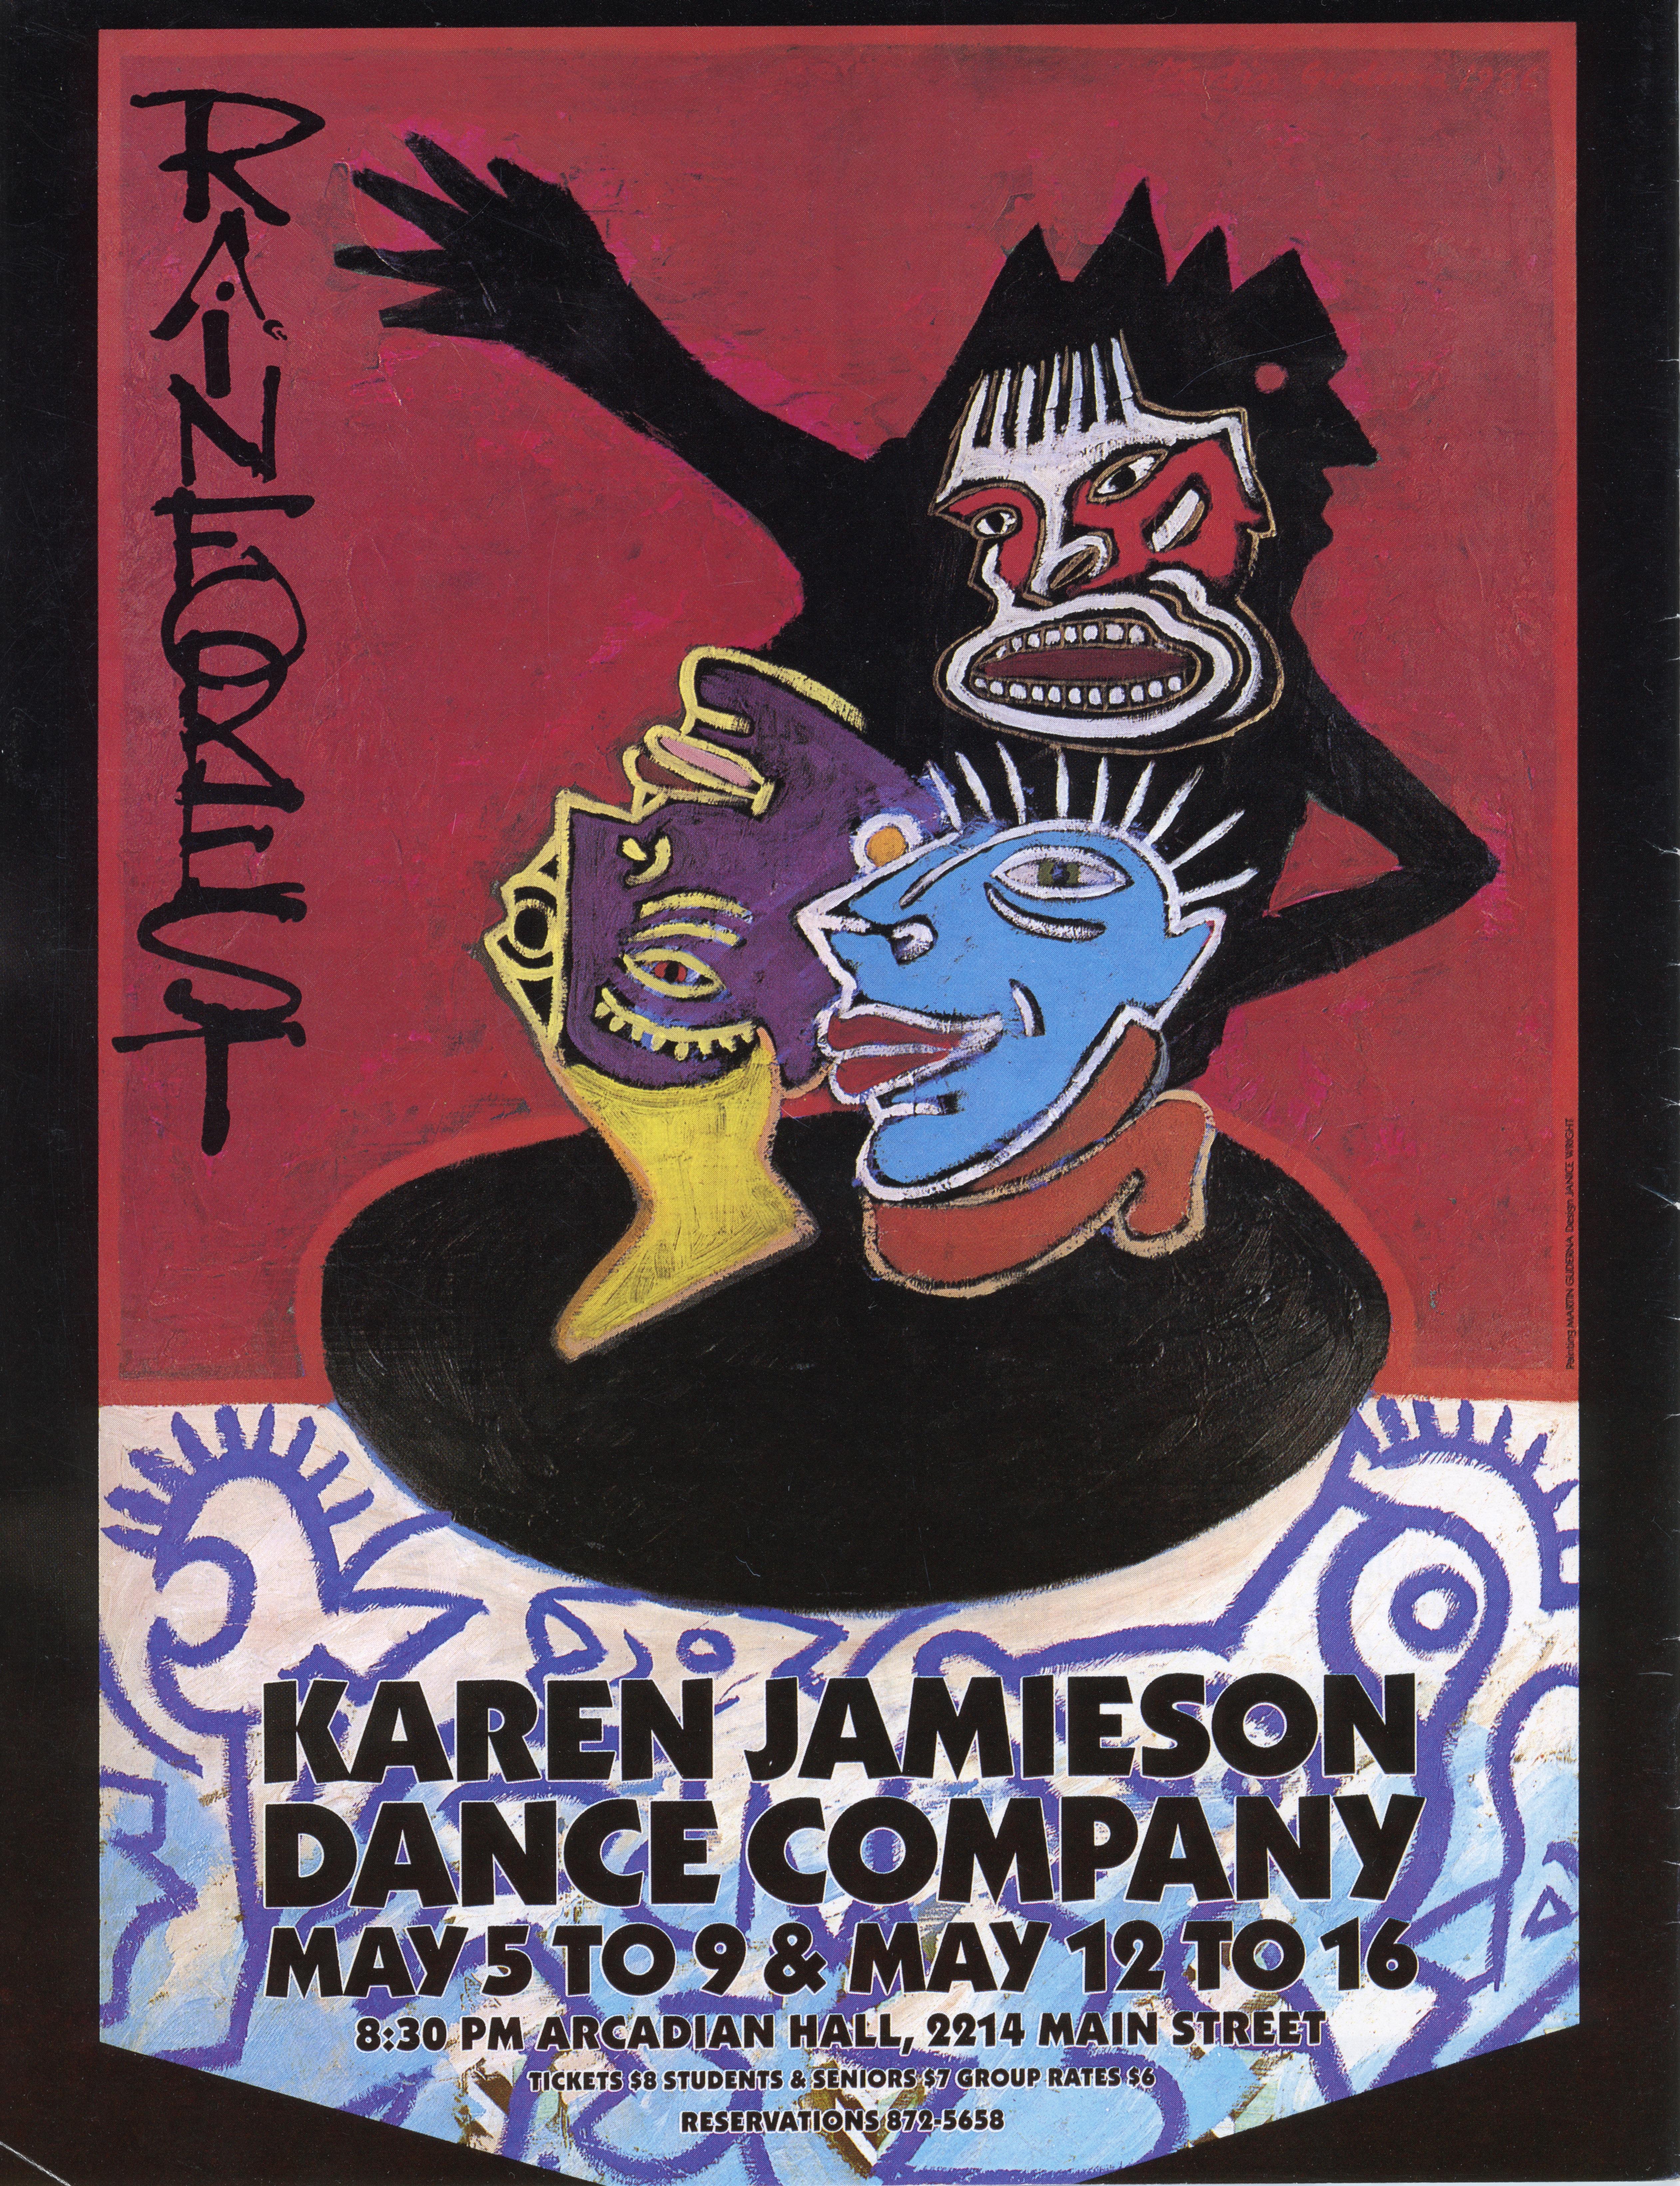 Rainforest_1987_ad_backside_Vancouver_Playhouse_photo_01.jpg